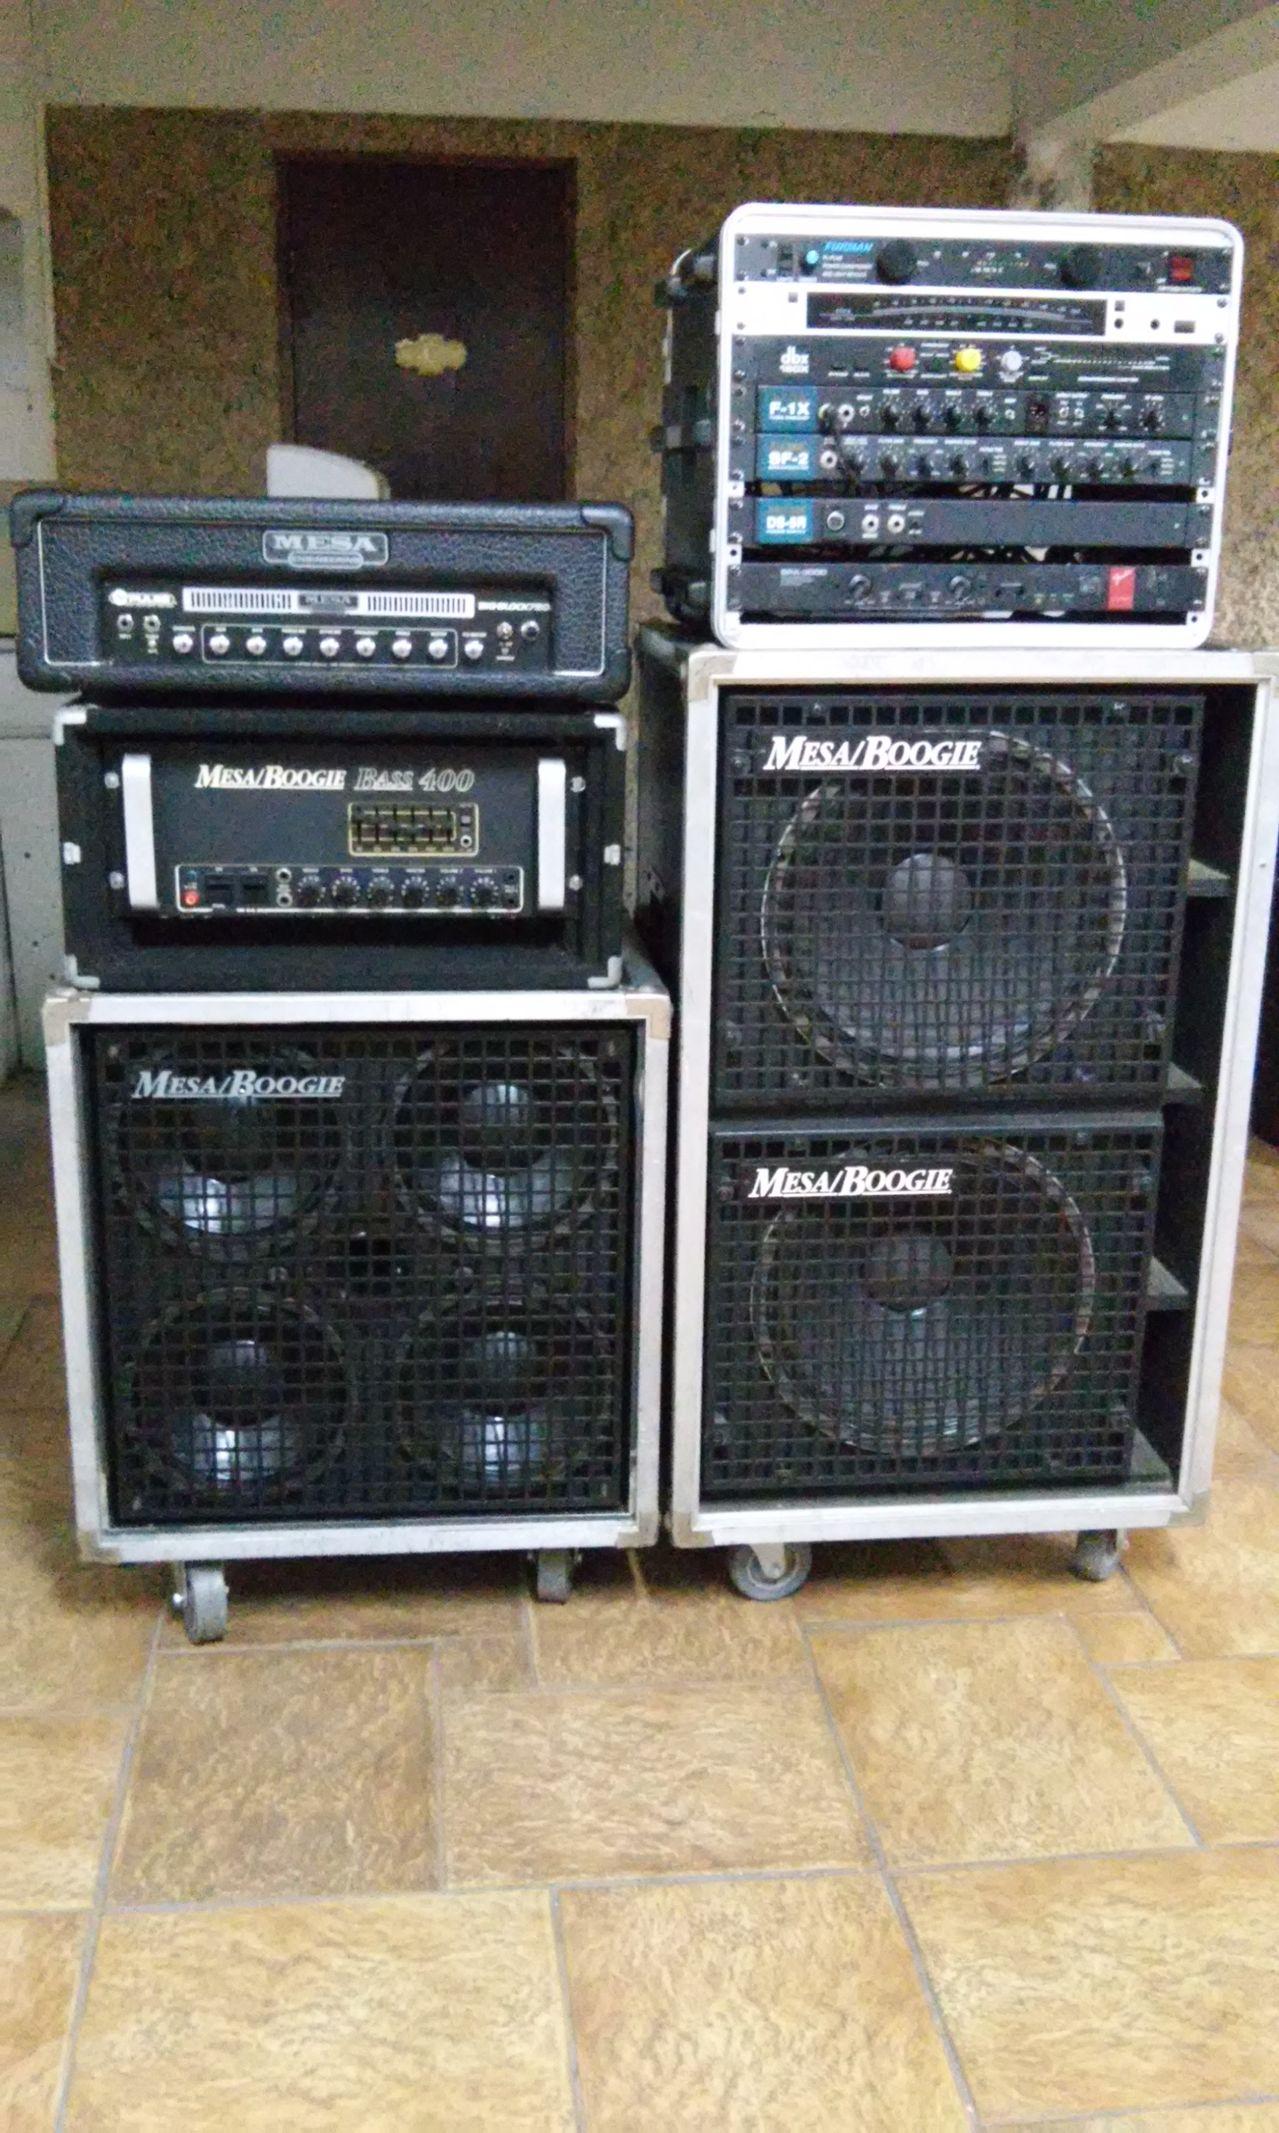 Mesa Boogie Club - Página 2 20140809_192147